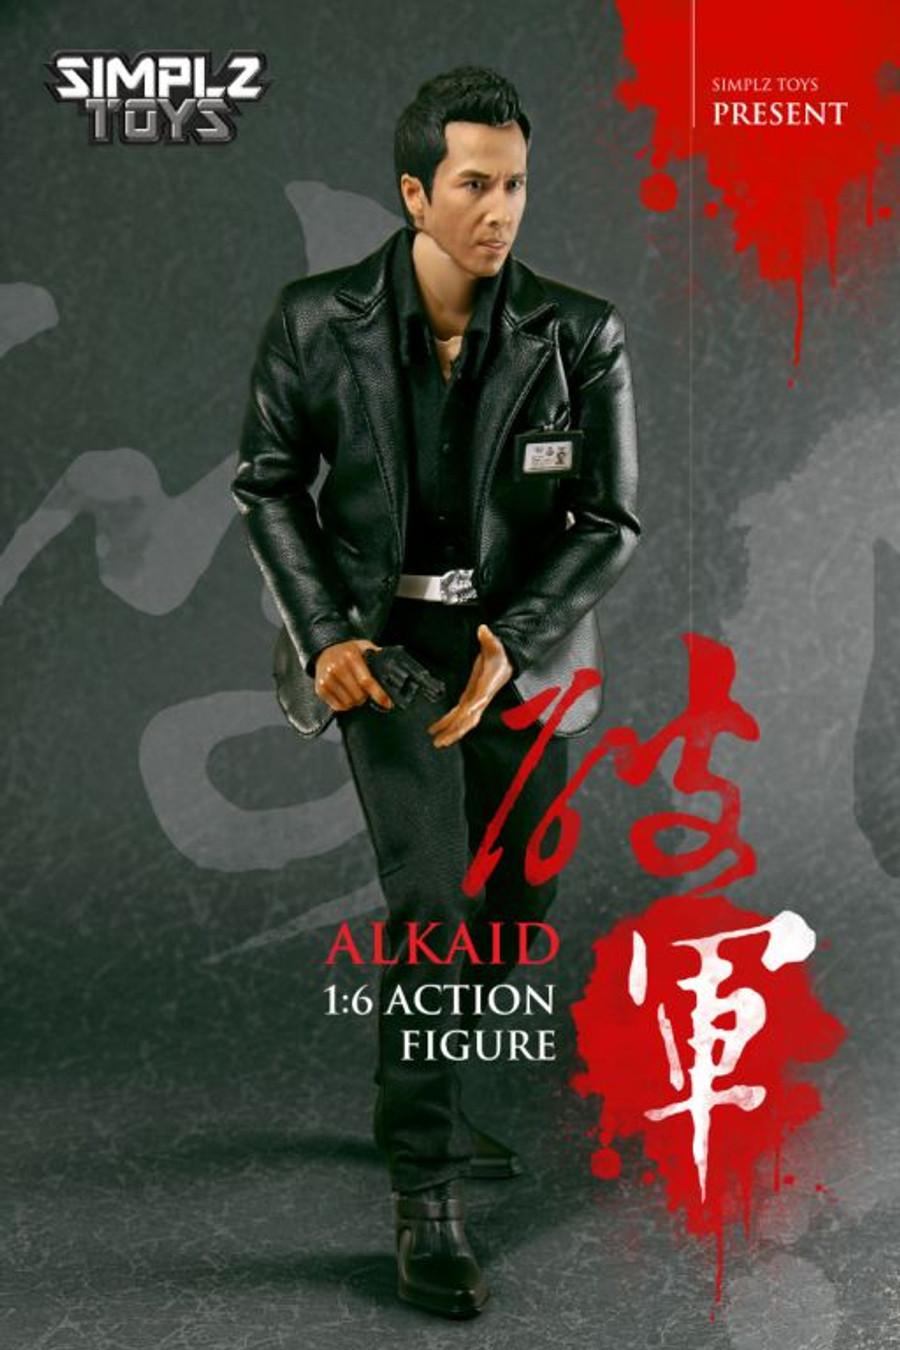 Simplz Toys - Alkaid - Donnie Yen